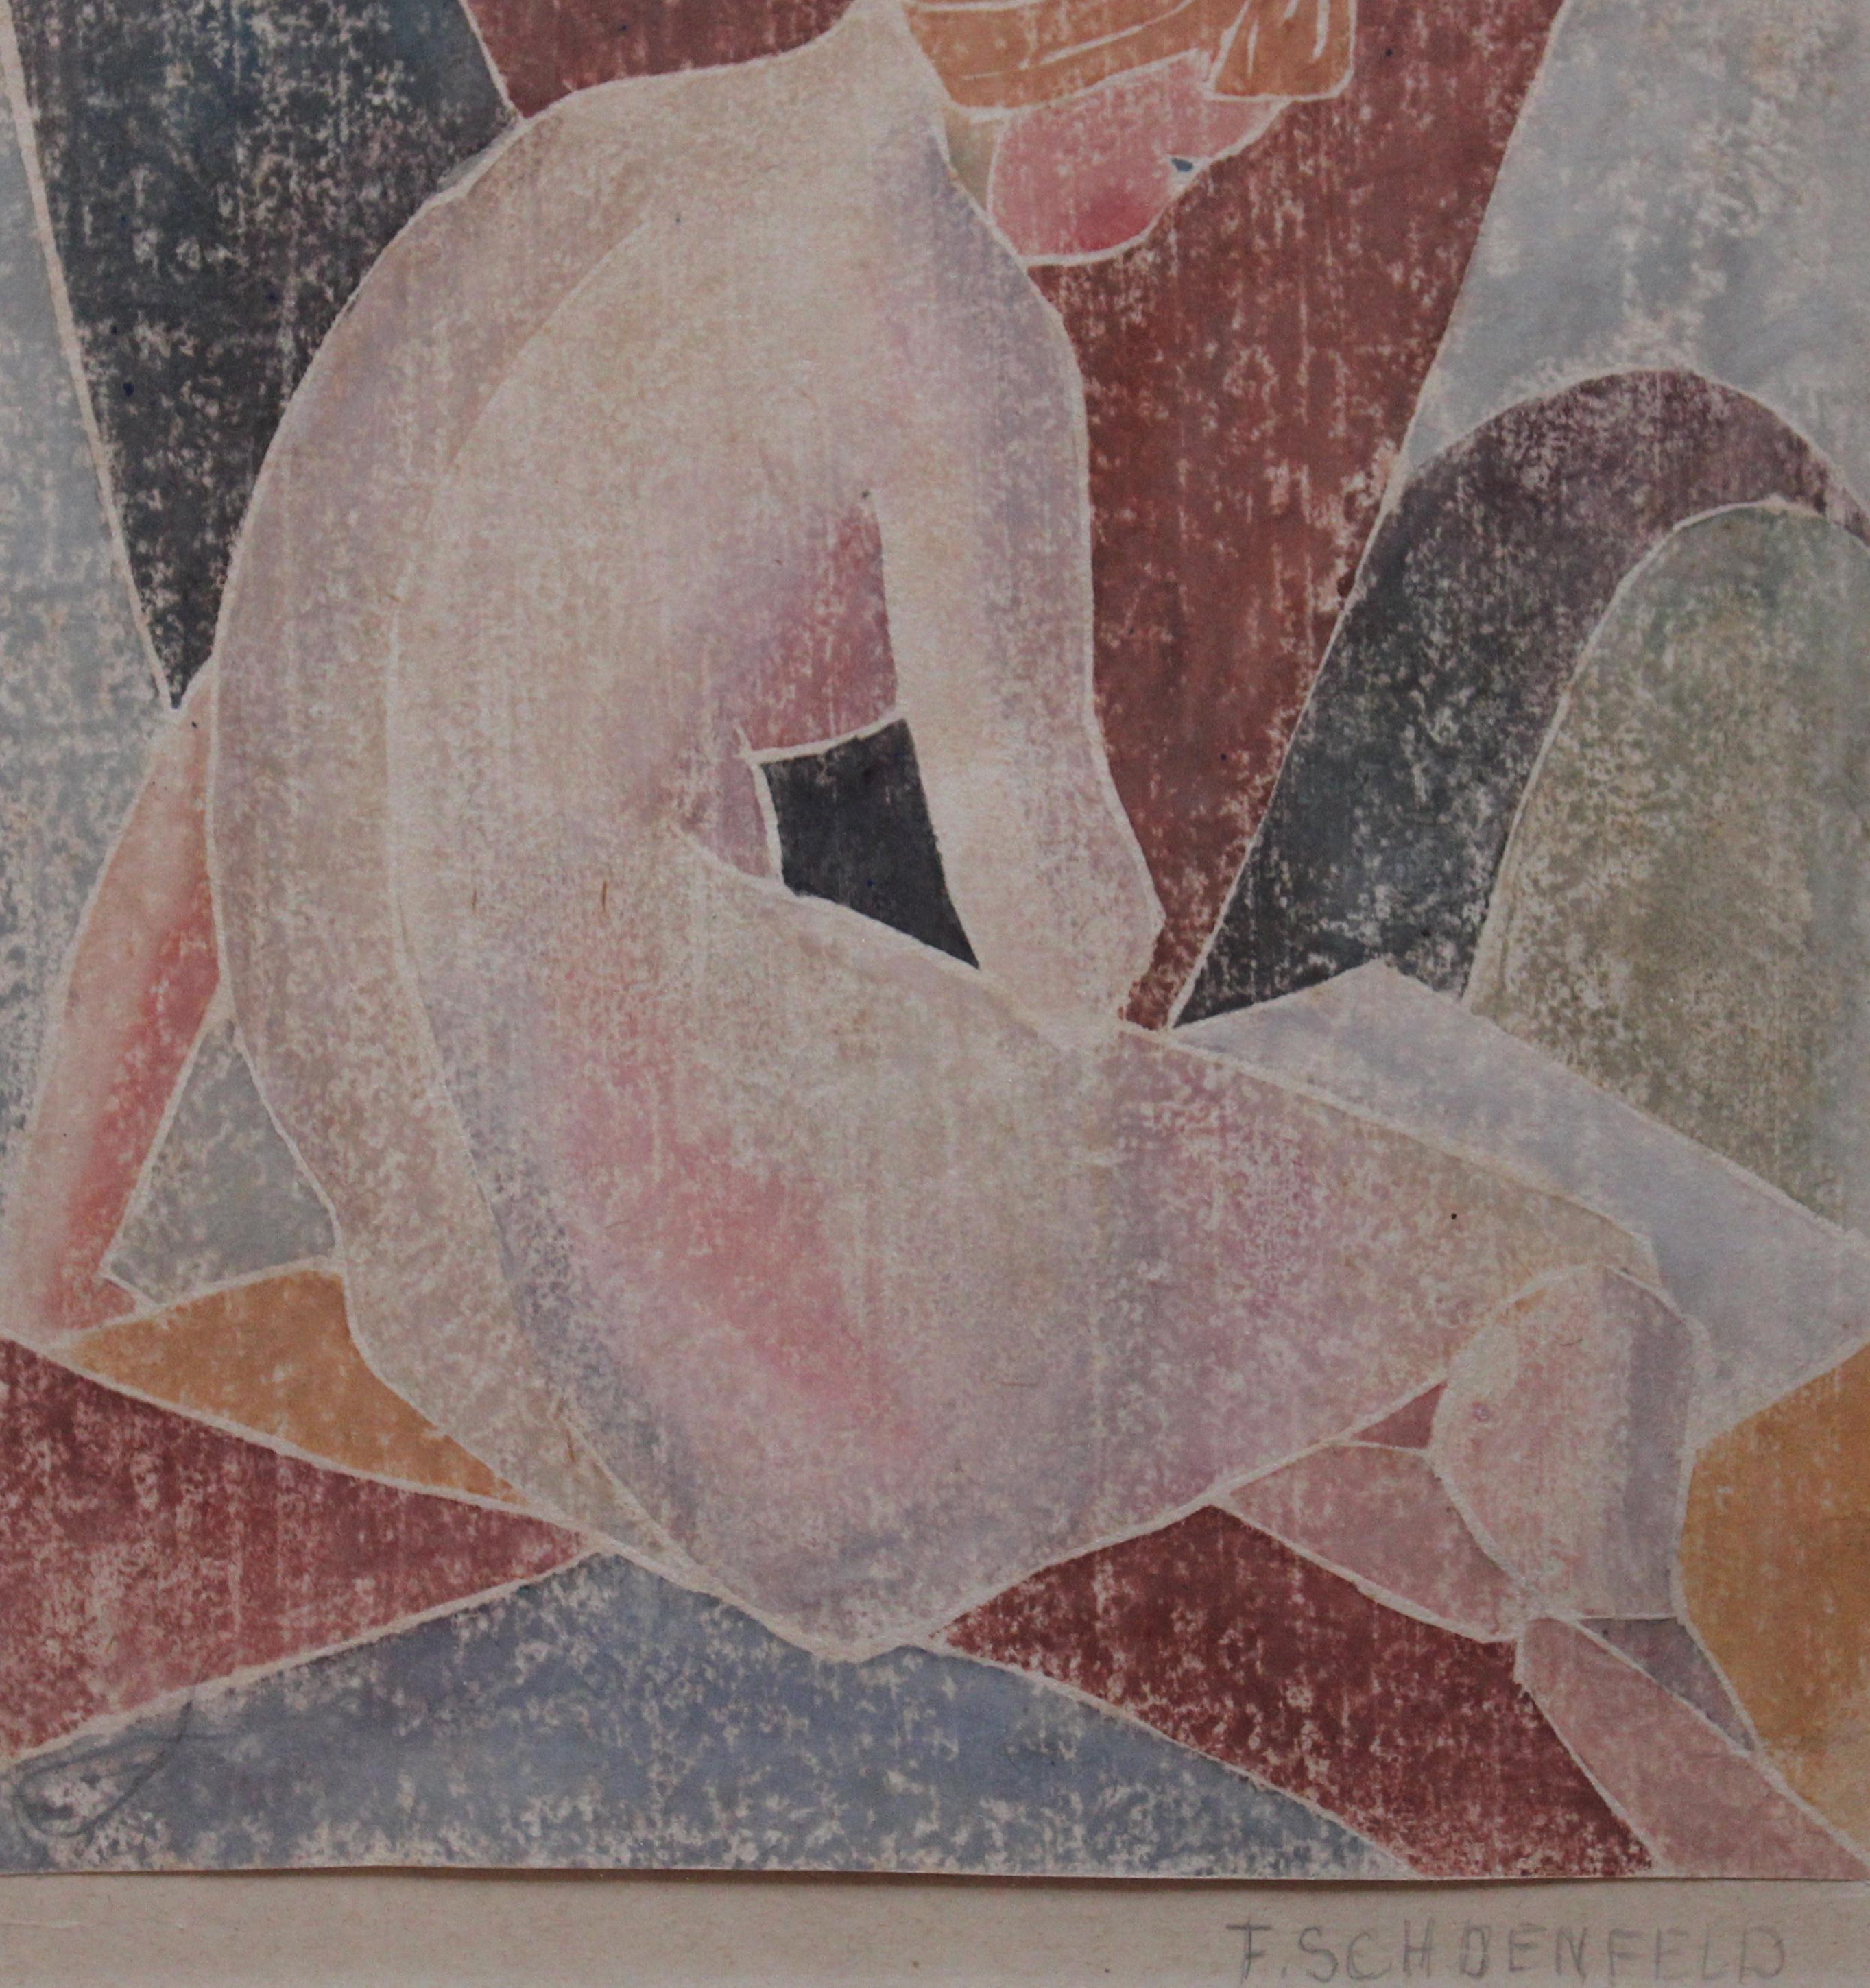 Schoenfeld.(Nude).JPG